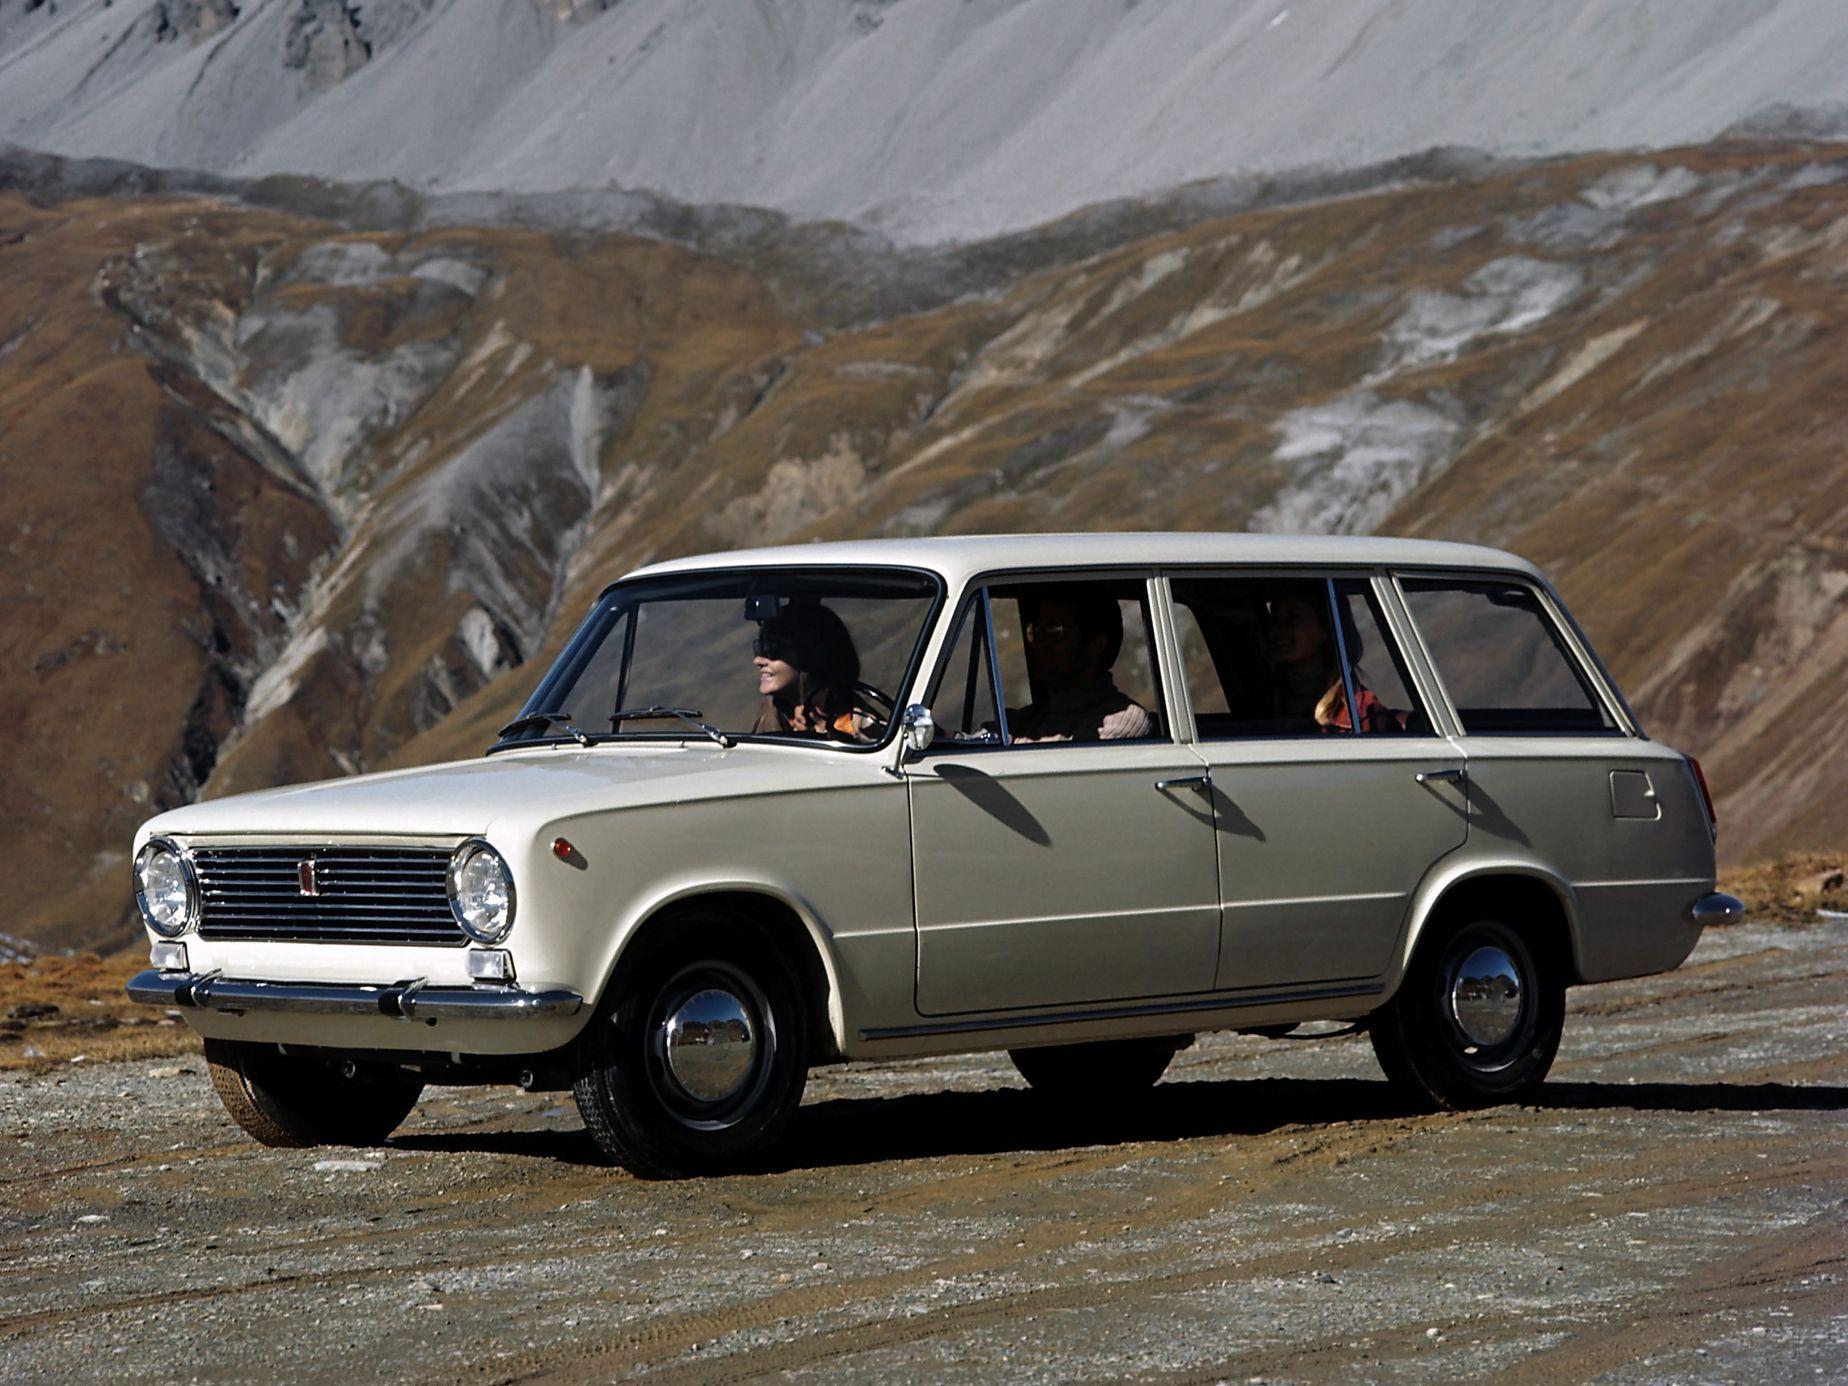 VAZ 21021 (Lada 1300 Combi)